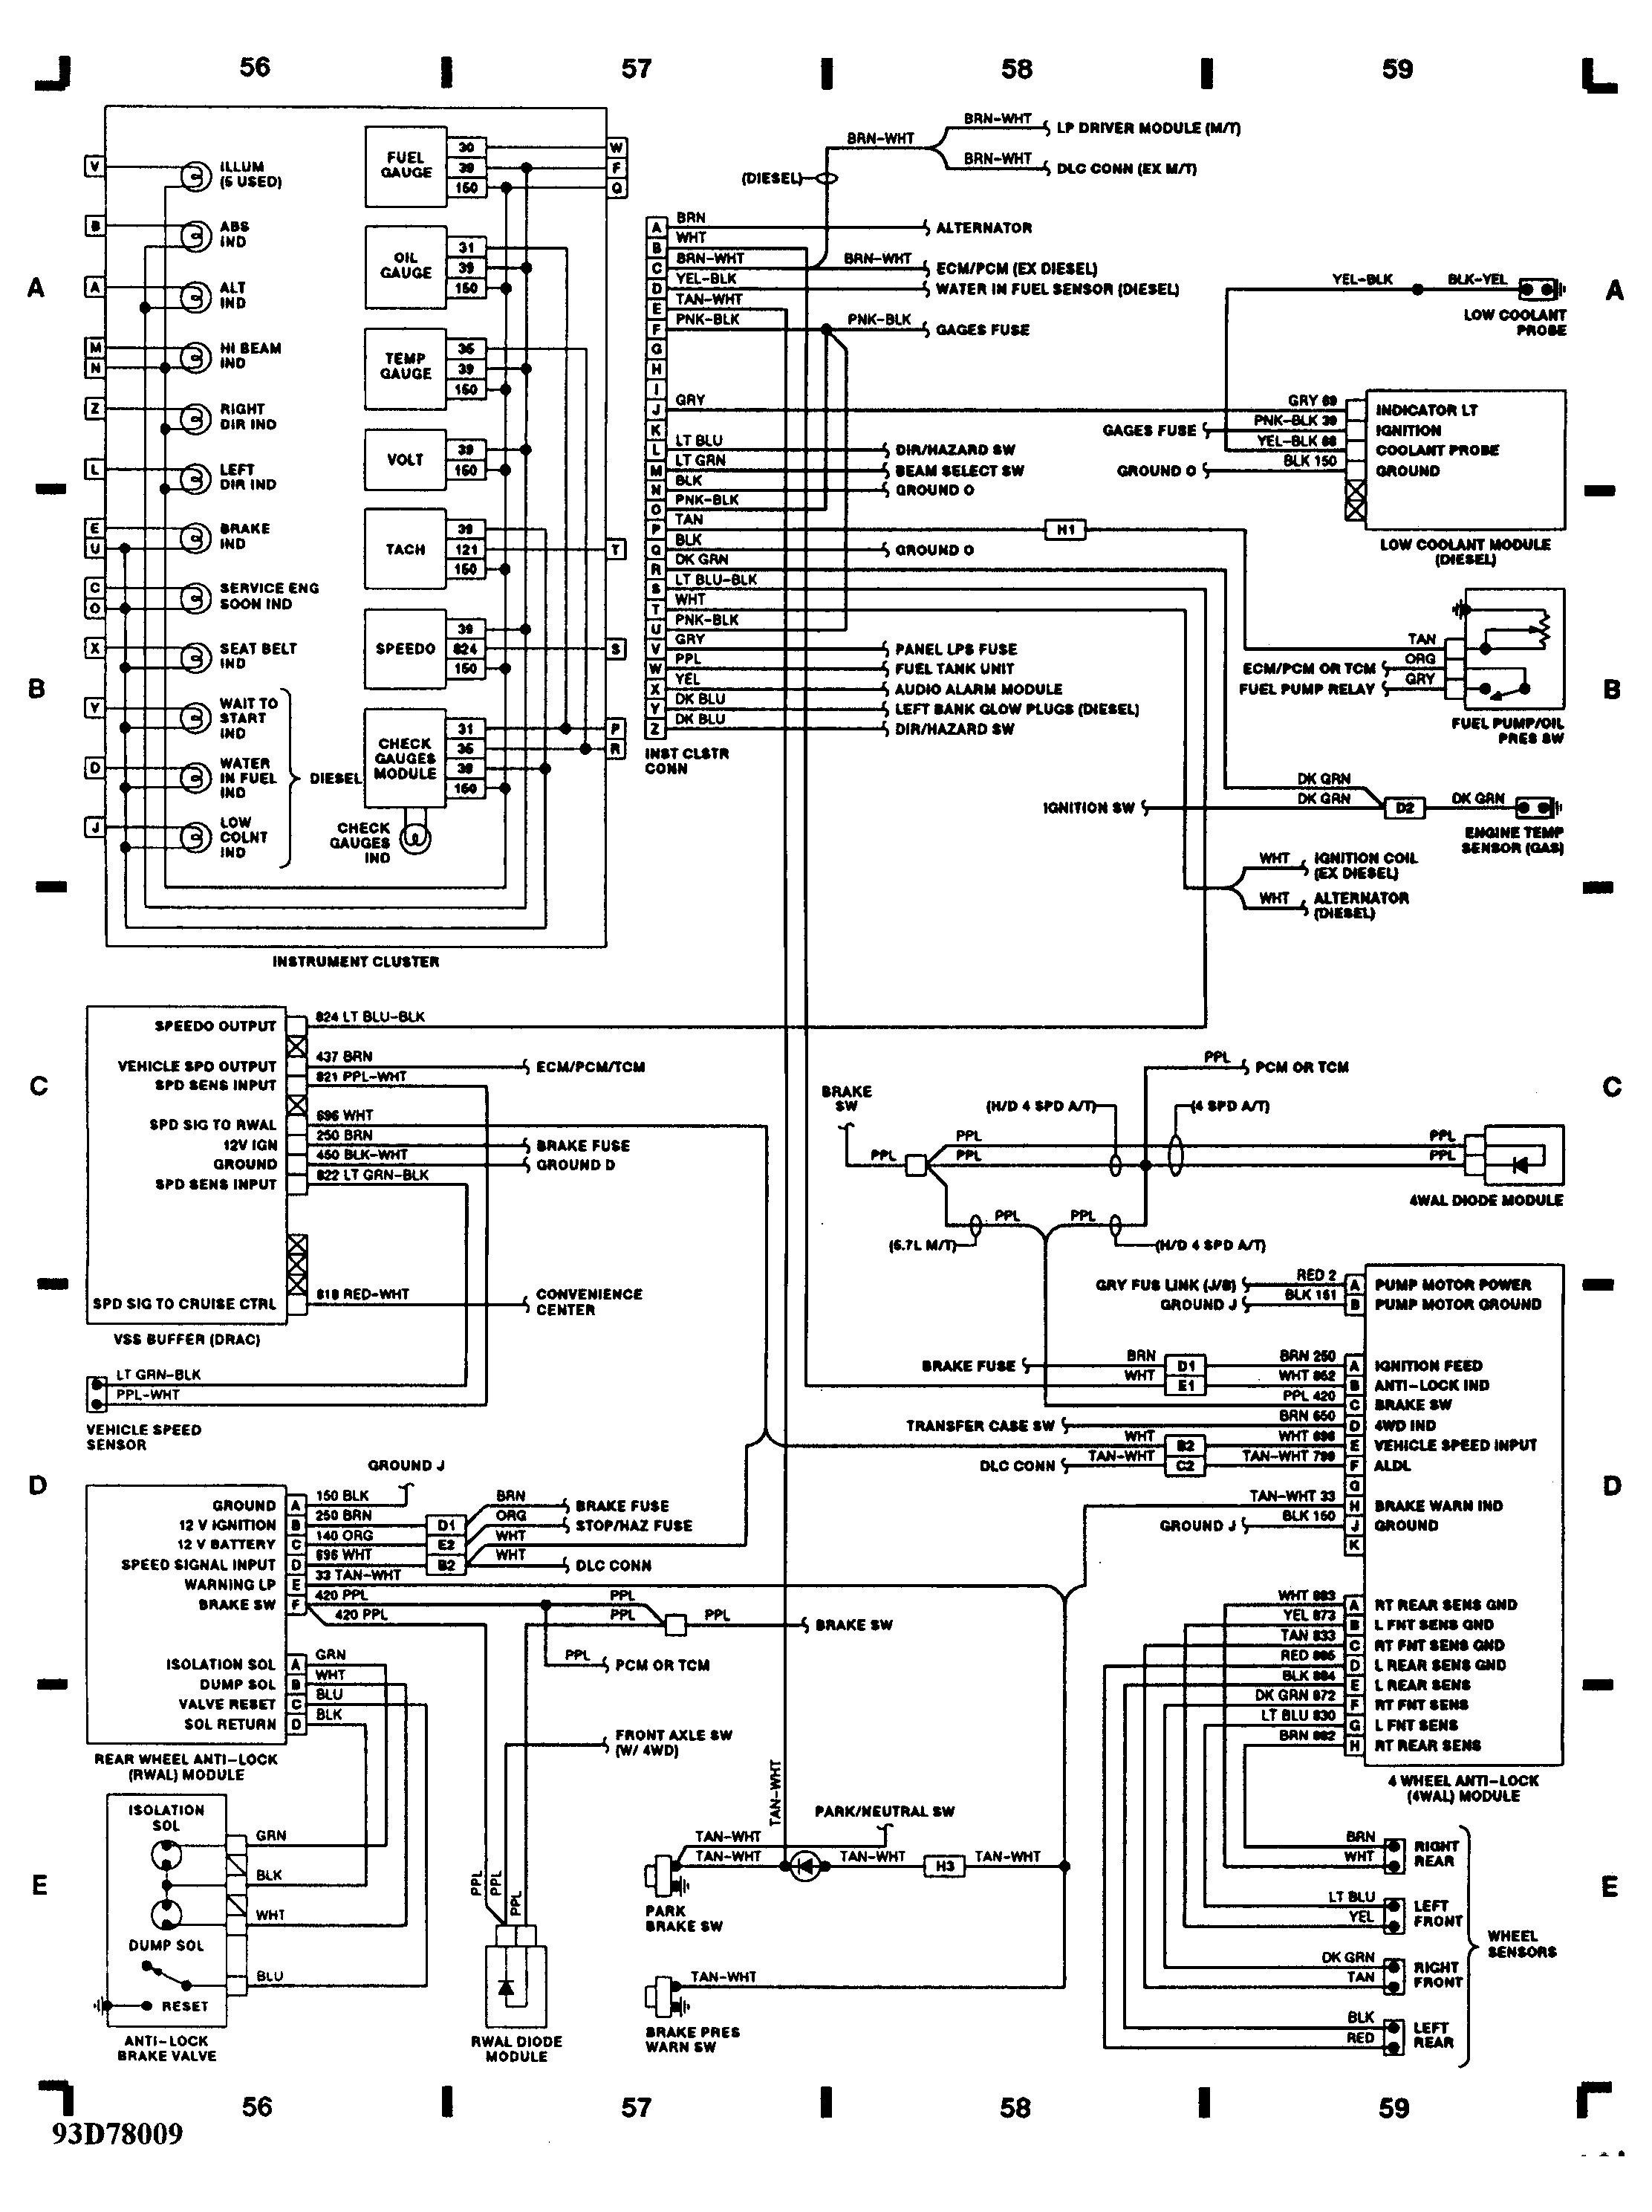 2002 Chevy Malibu Engine Diagram 2002 Ls1 Engine Diagram Another Blog About Wiring Diagram • Of 2002 Chevy Malibu Engine Diagram